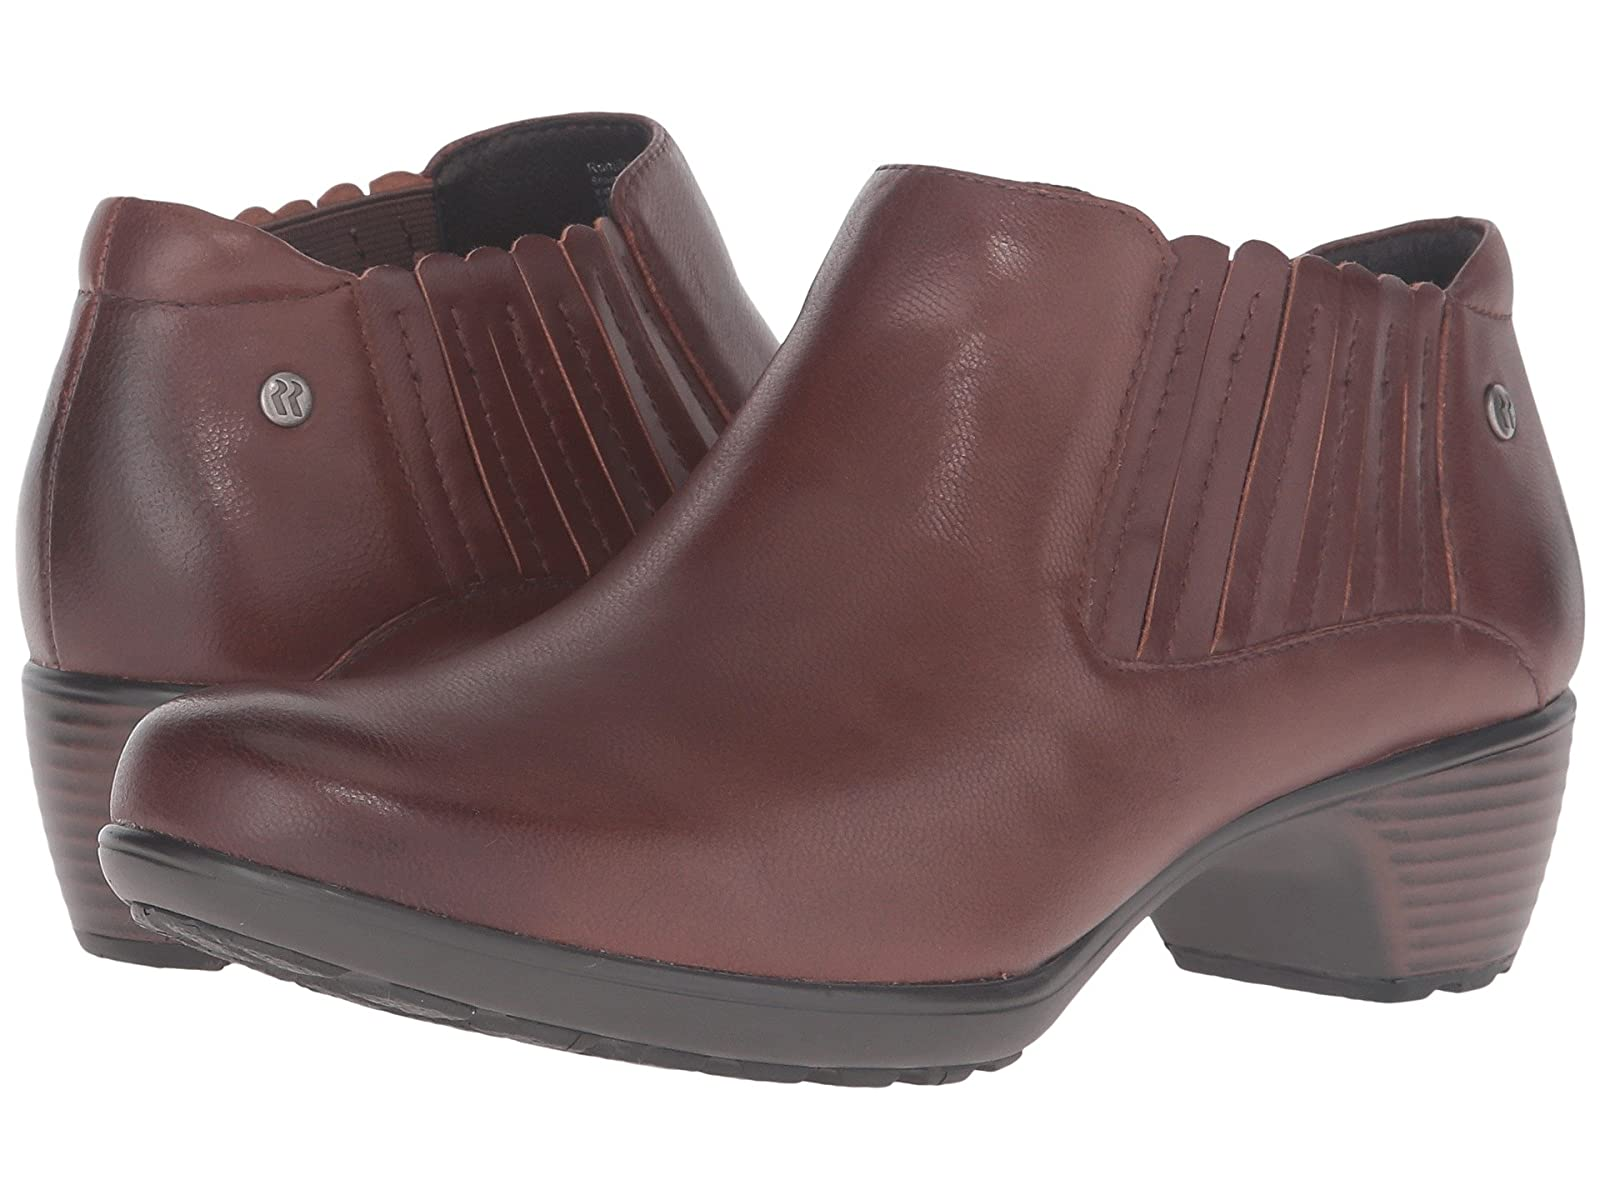 Romika Banja 15Cheap and distinctive eye-catching shoes